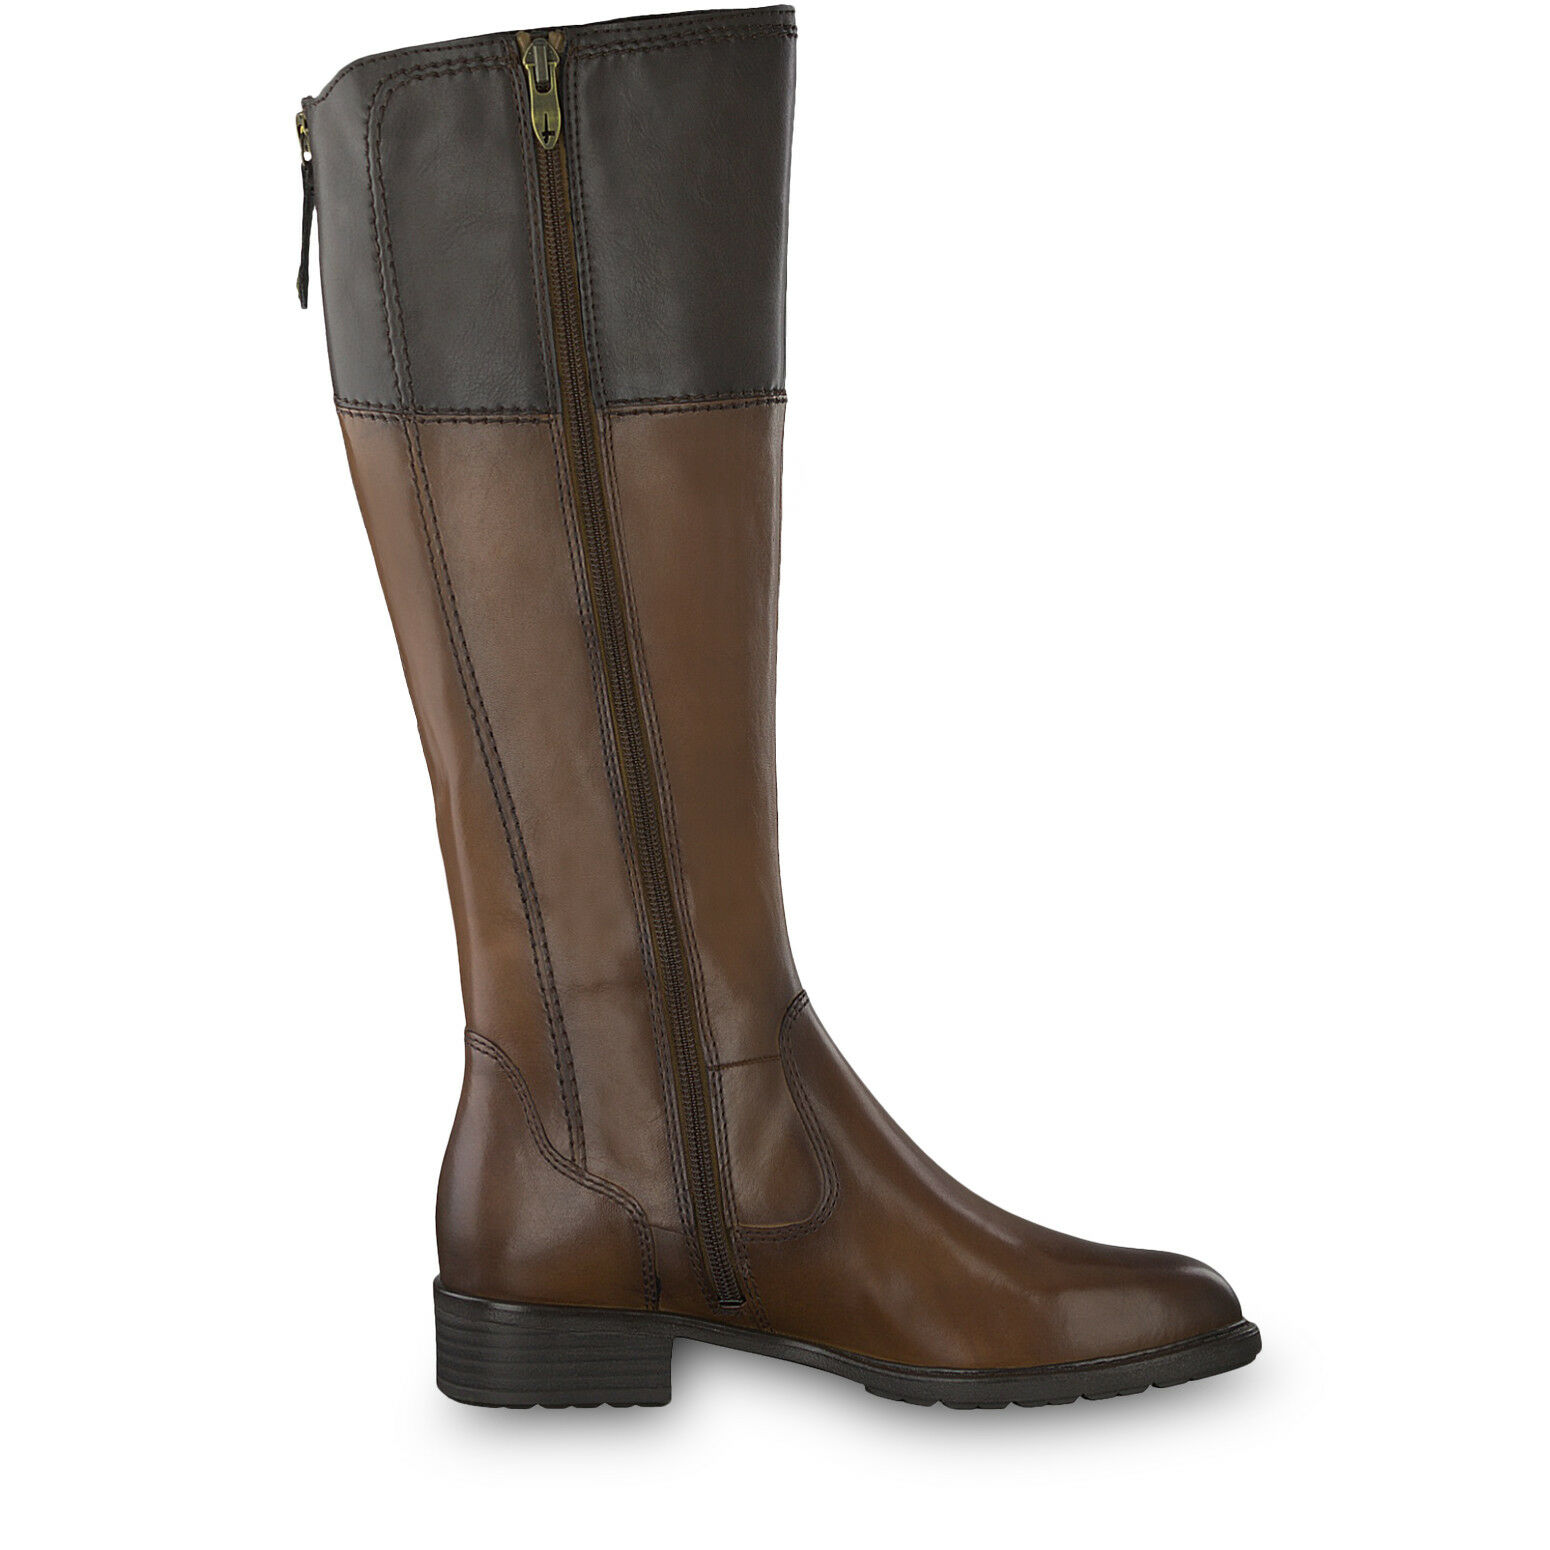 Tamaris damen 25508-21 25508-21 25508-21 Cognac Mocca Leather Synthetic Knee Length Winter Stiefel    2e3057